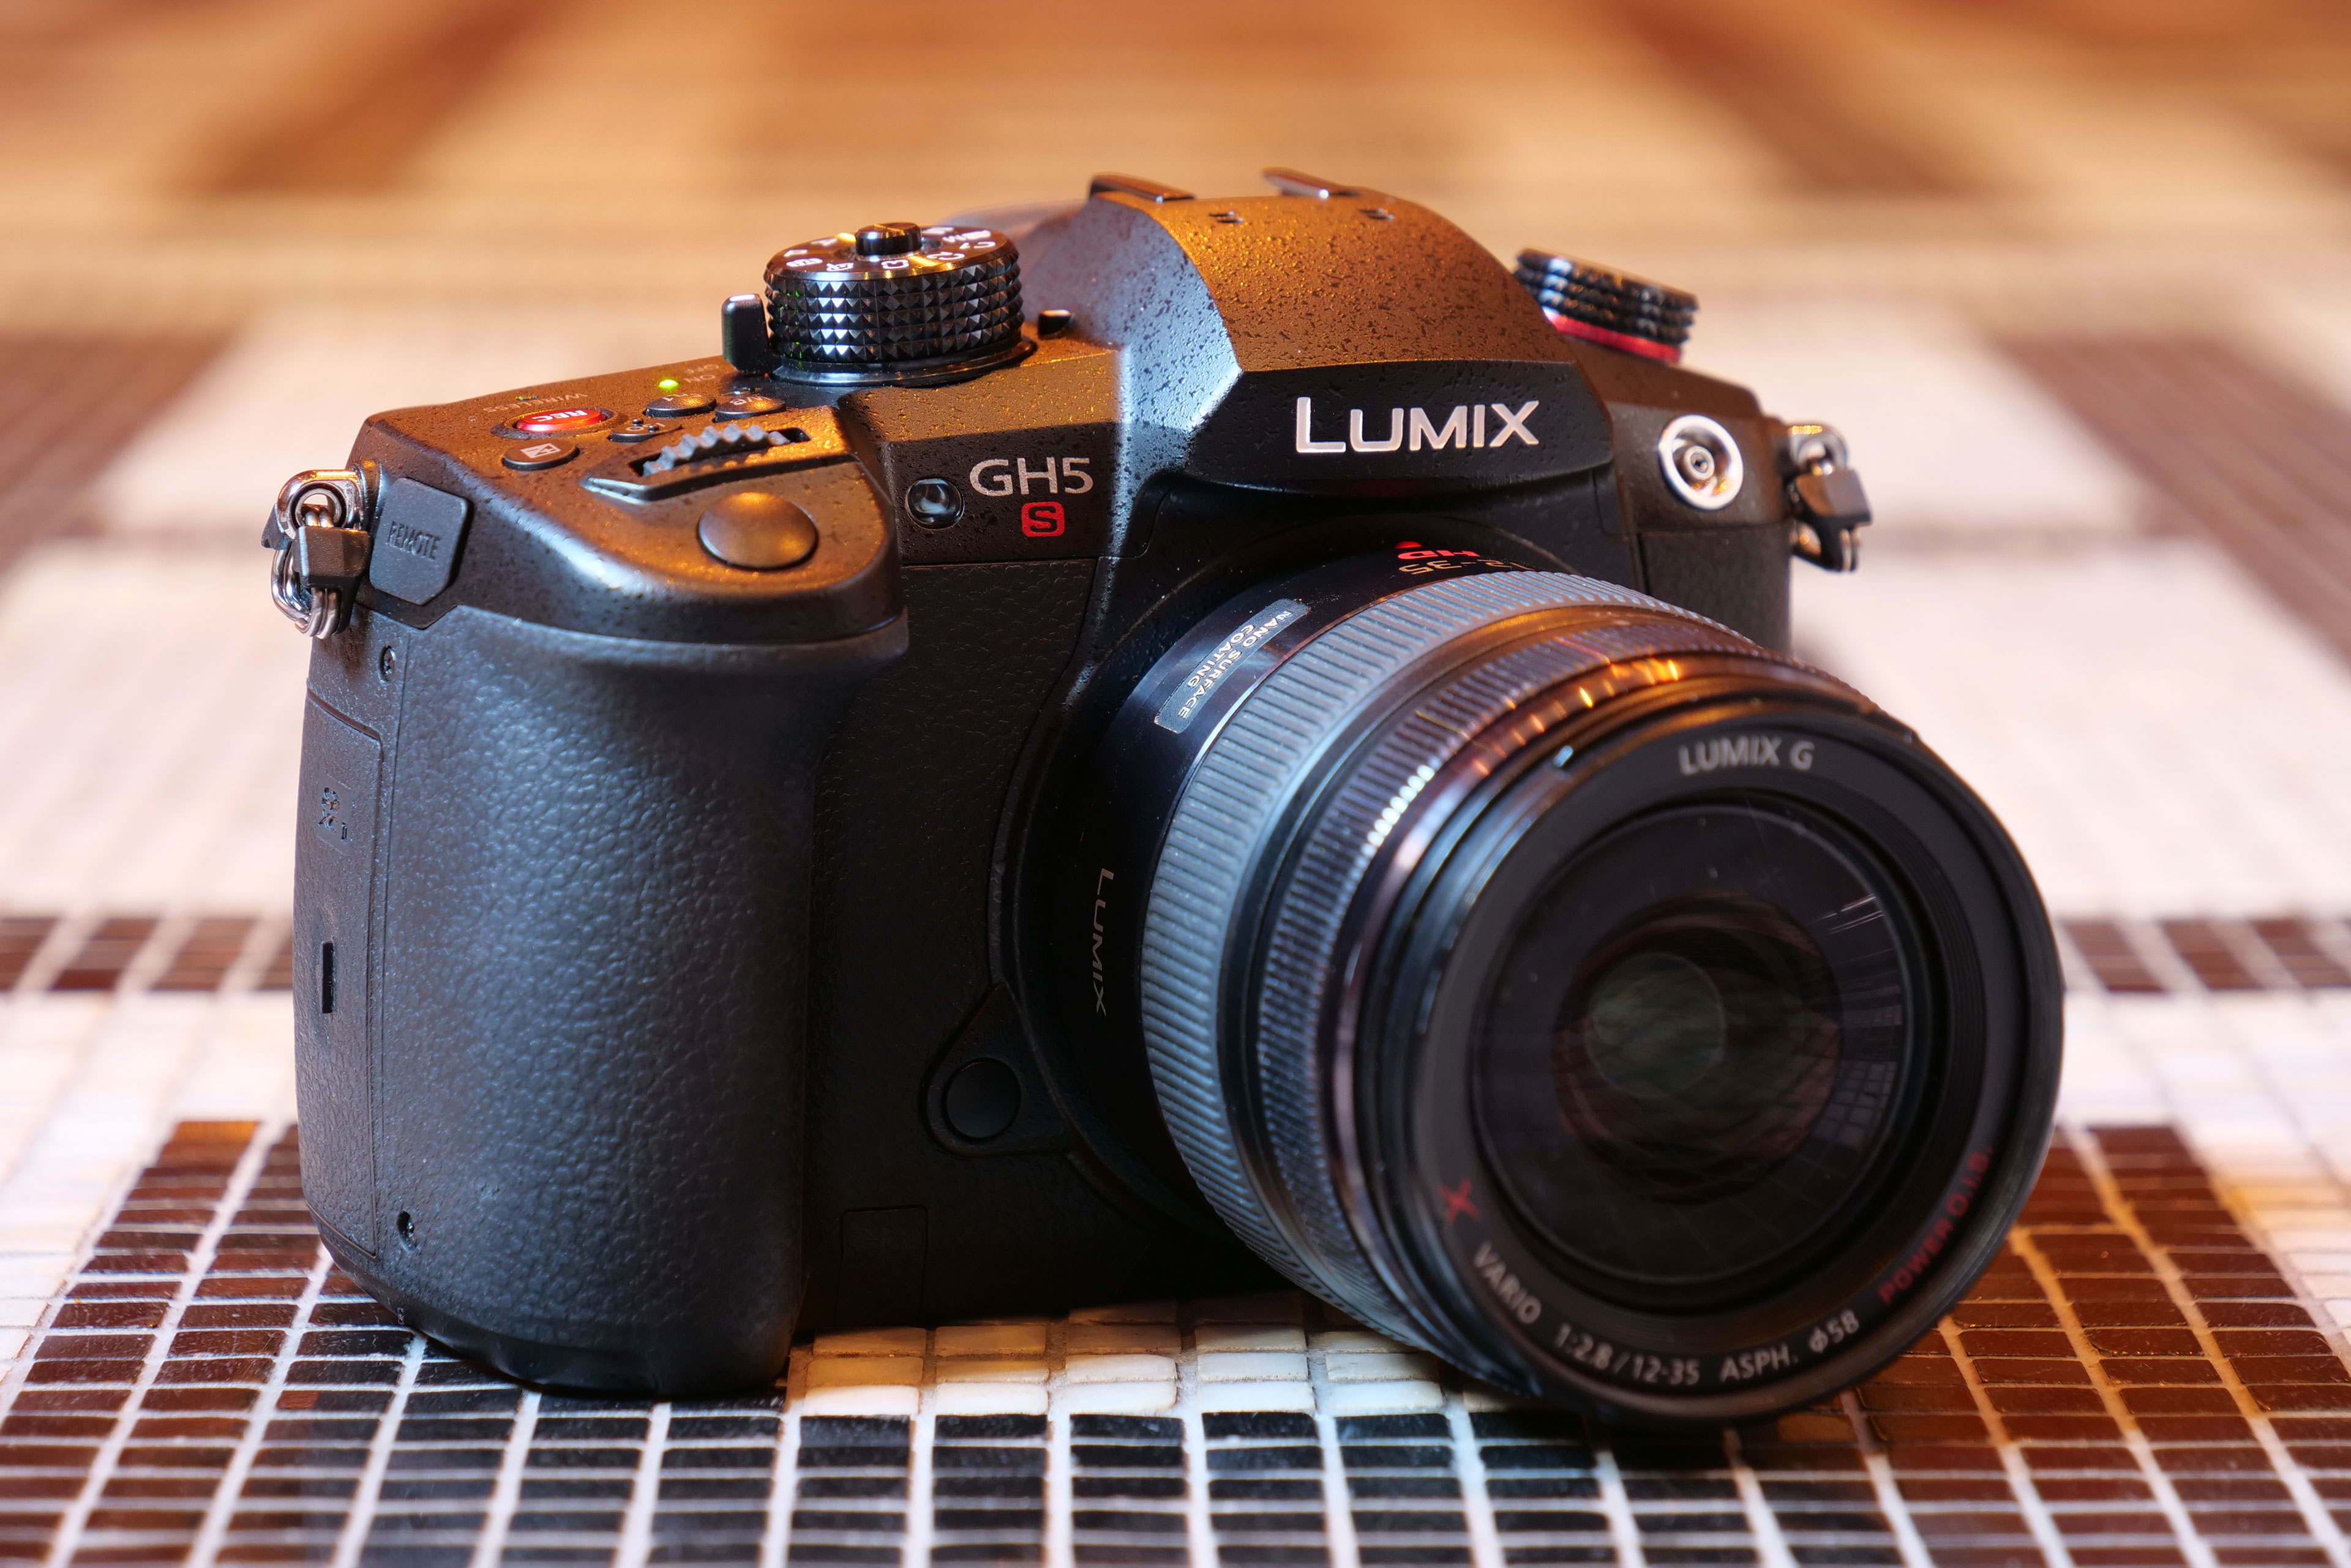 Panasonic Lumix GH5S review so far - | Cameralabs